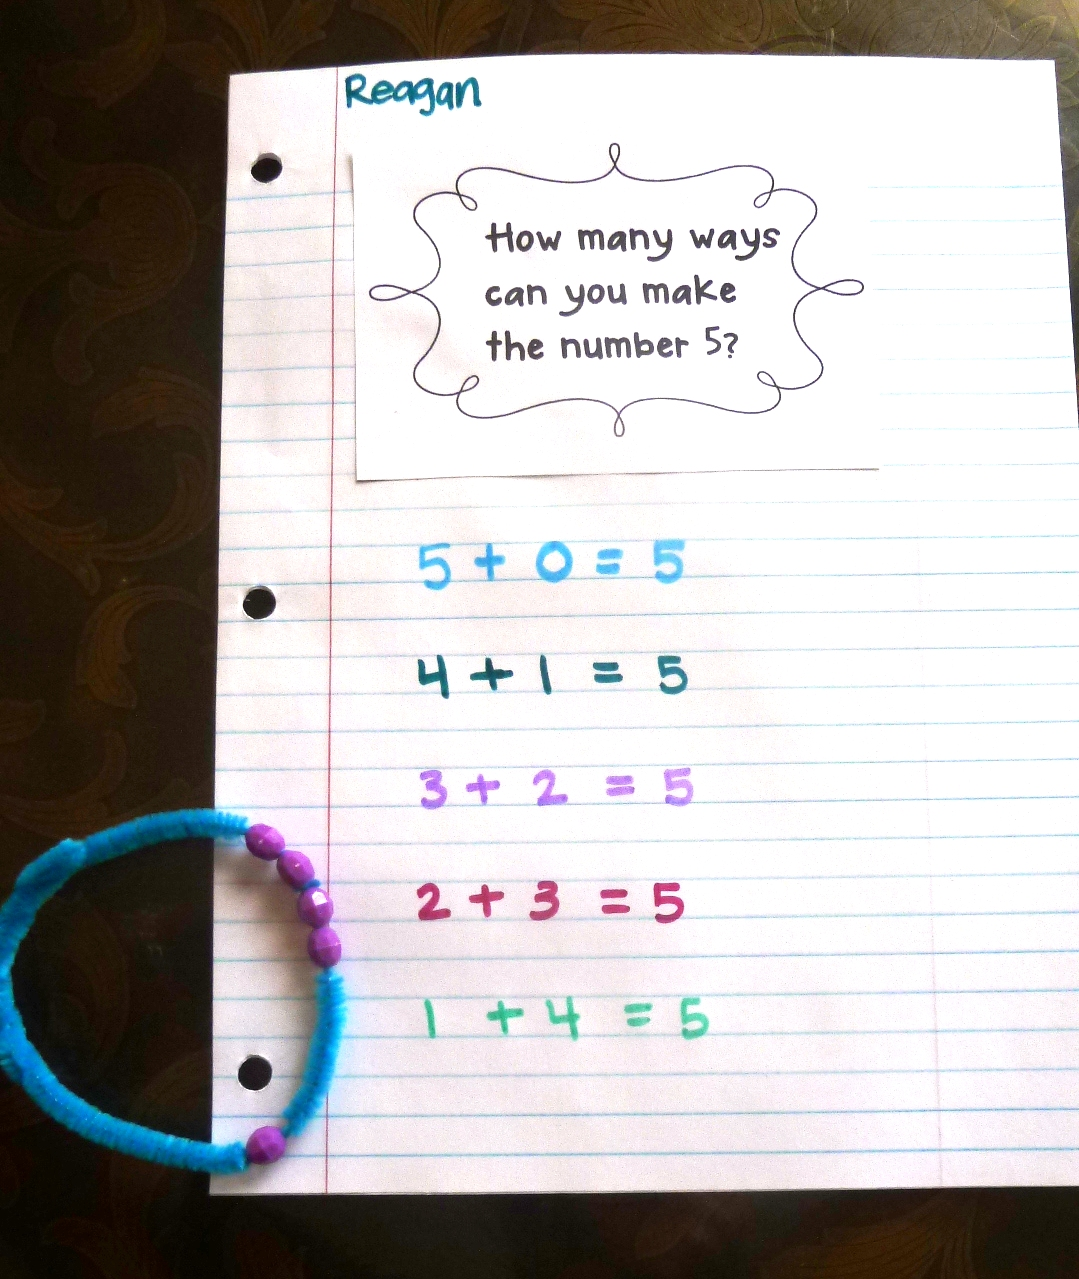 Worksheet First Grade Number Stories simple number stories for first grade two step story problems math worksheet bracelets tunstall s teaching tidbits grade